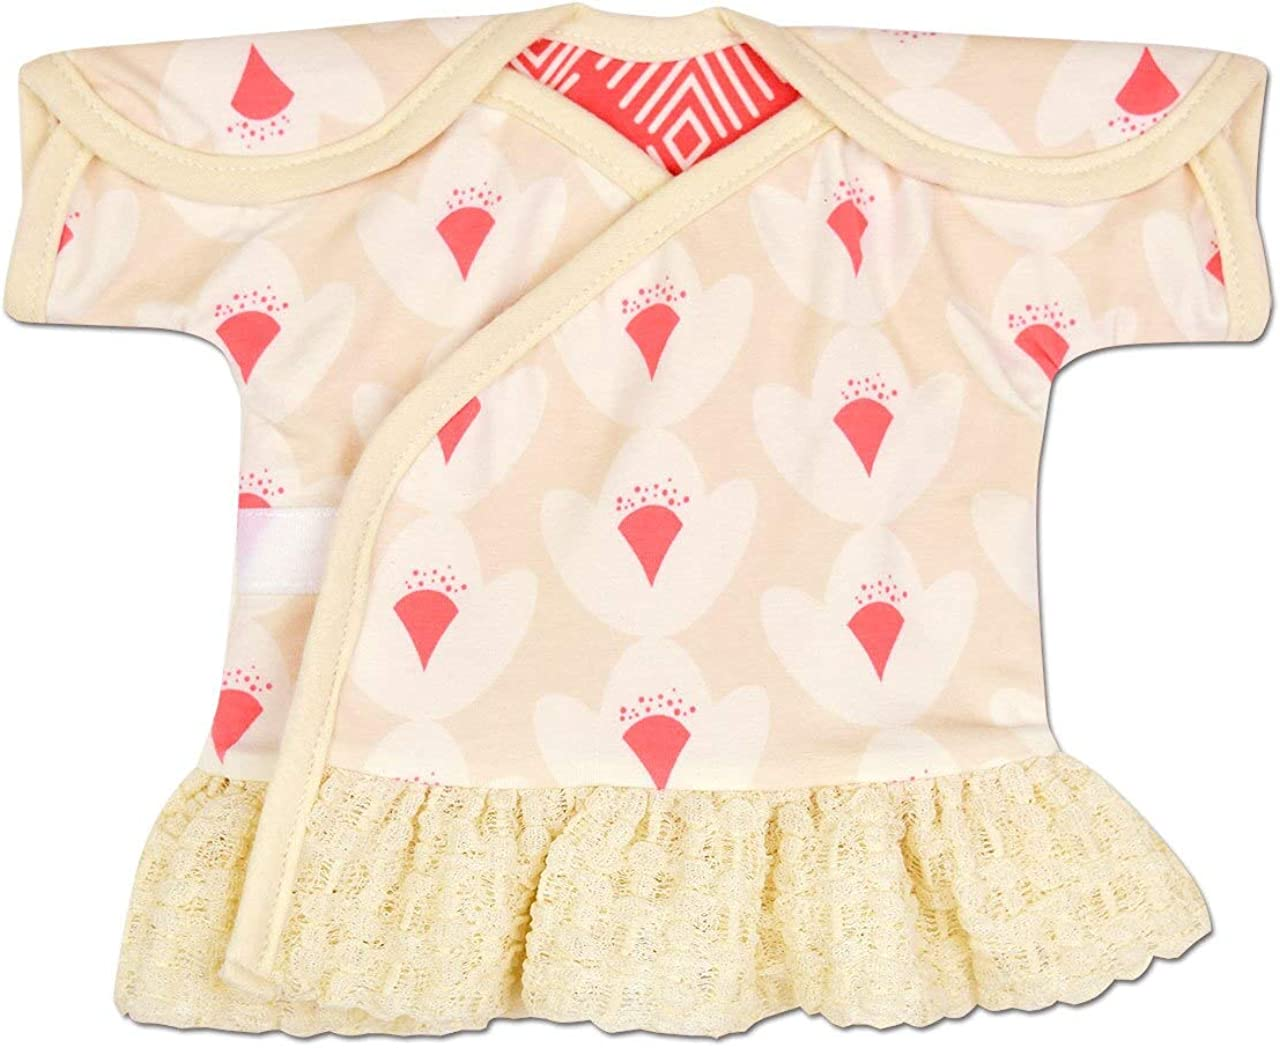 6 Long PreemieMicro Preemie Pink Lace Dress or Burial Garment 0-3 Months